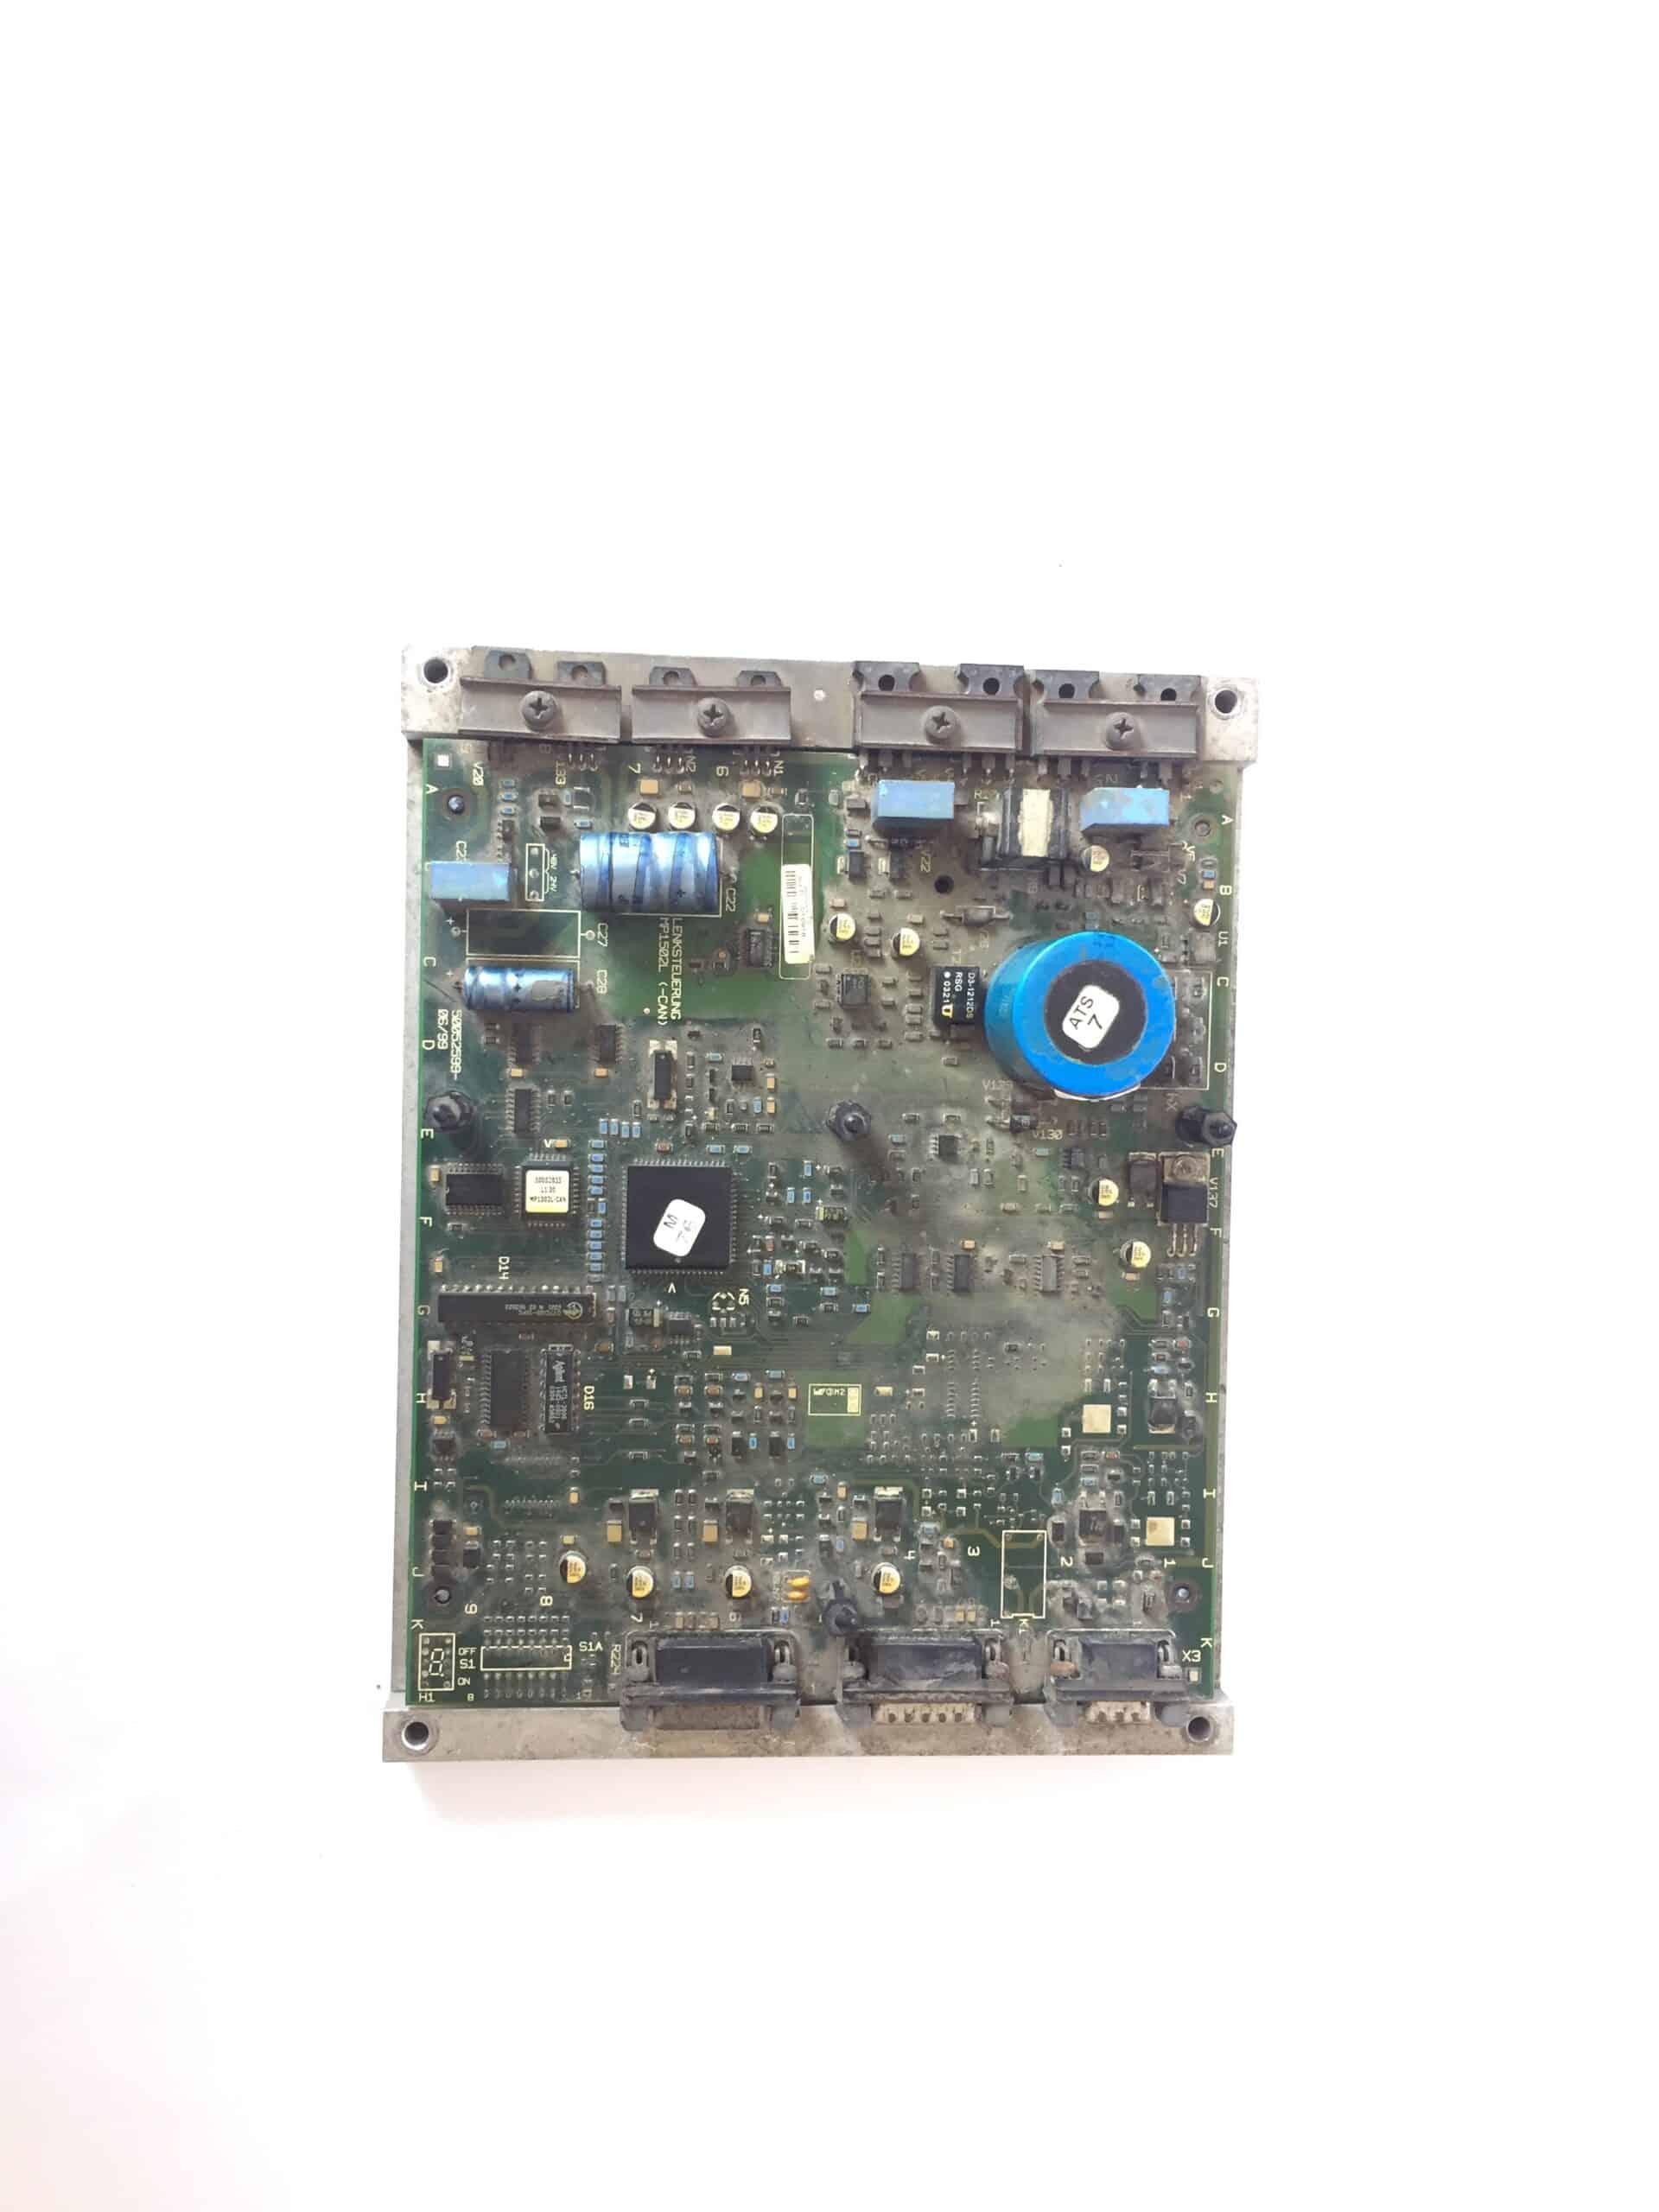 | DRIVE CONTROLLER CARD | Fazl-e-Rasheed and Company August 2021